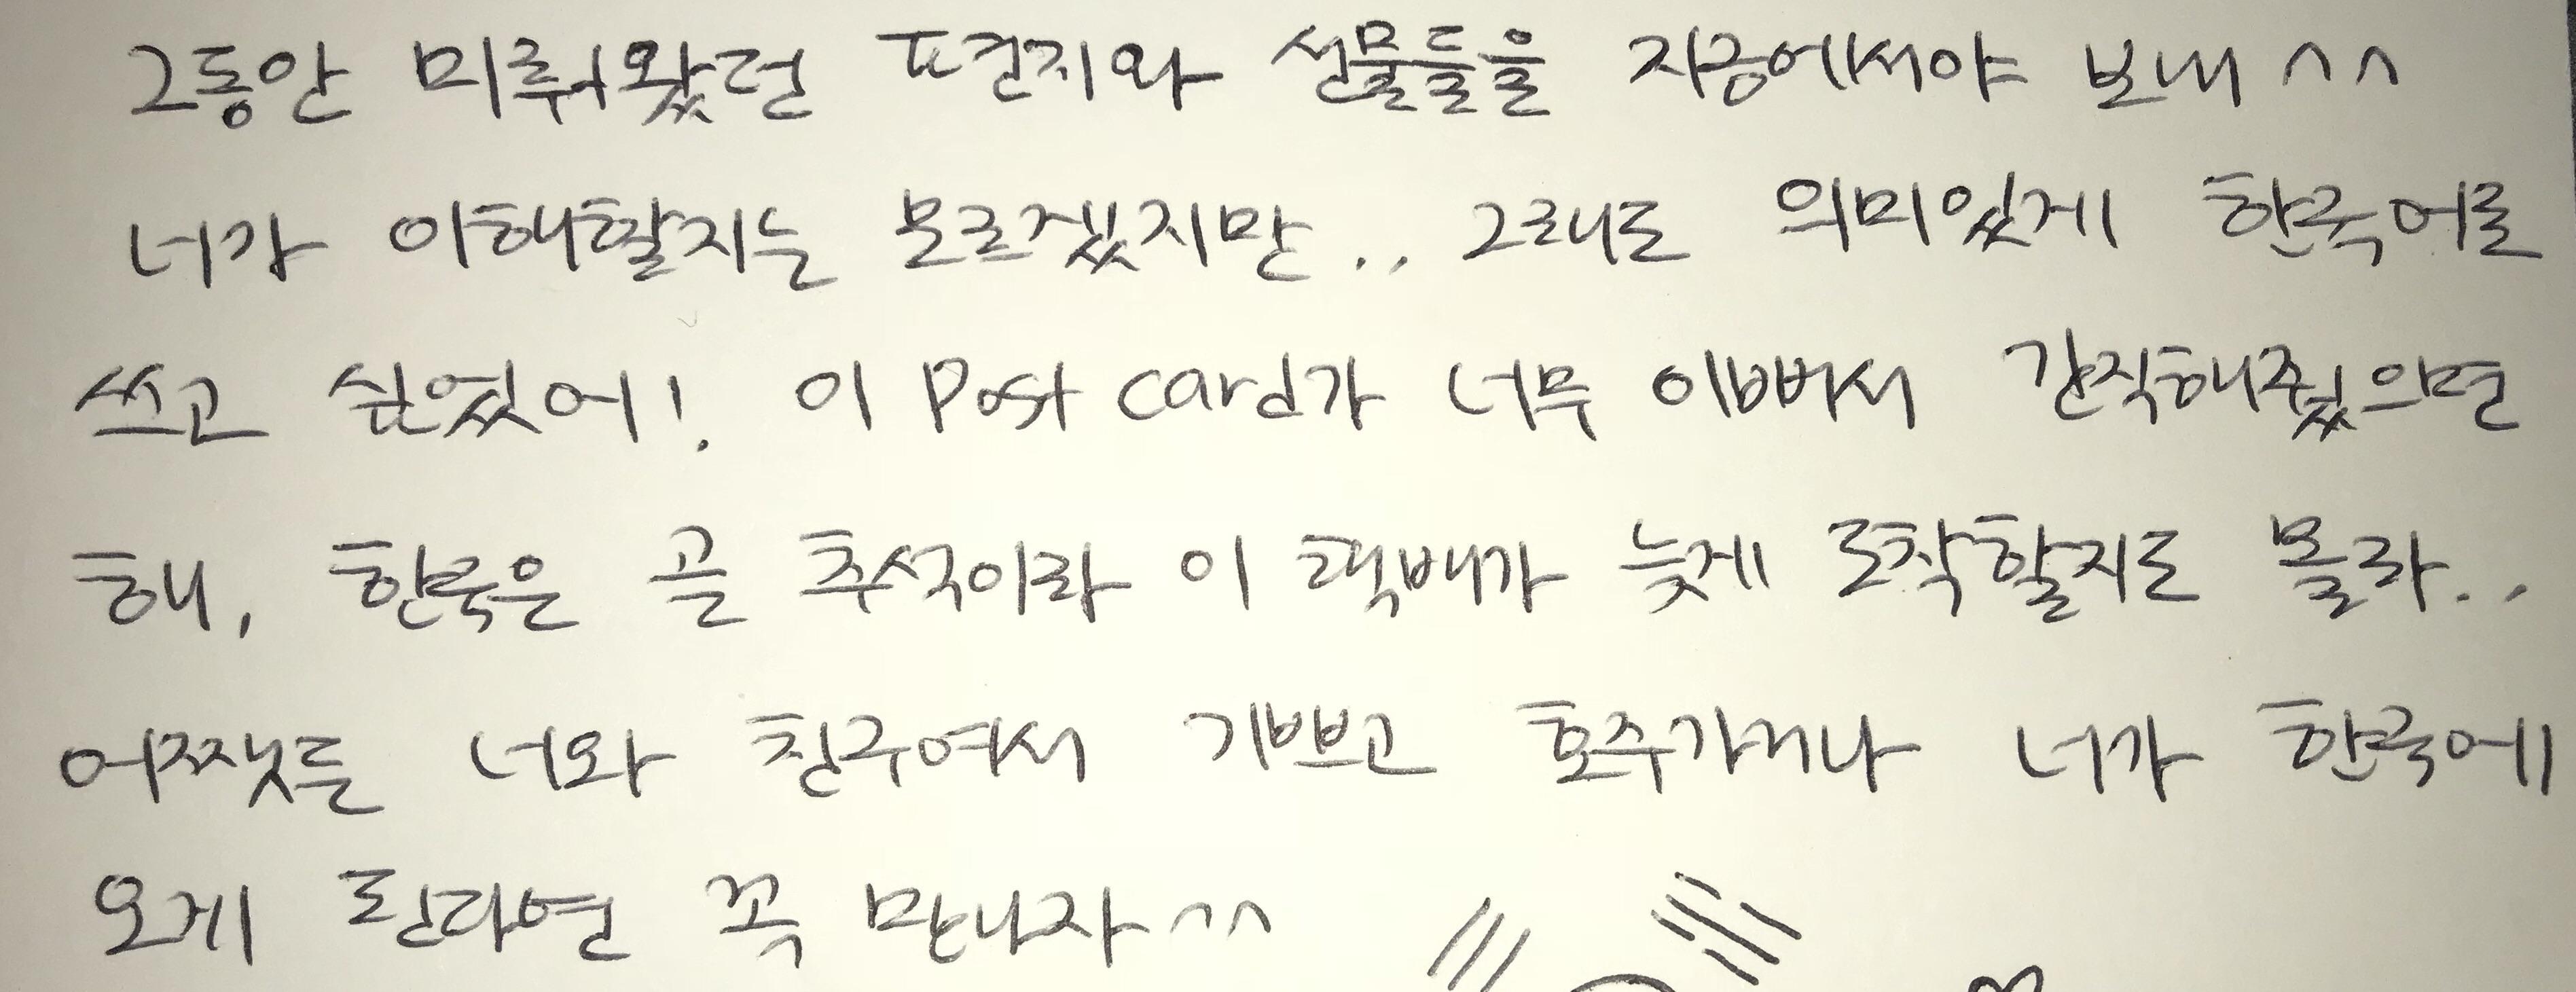 Korean Gt English Friend Sent Me A Postcard But I Have